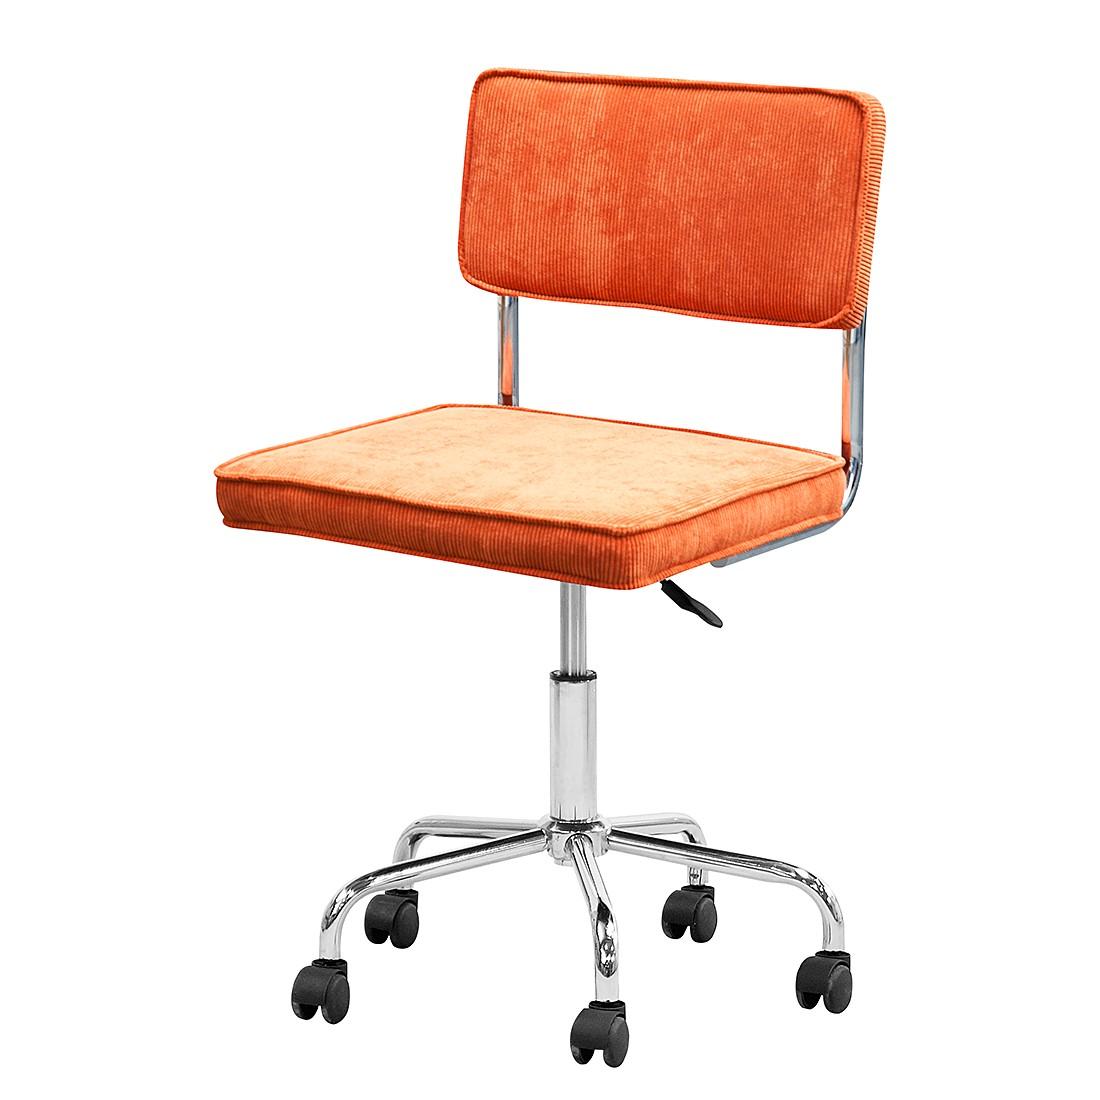 Bürodrehstuhl Marlon – Webstoff Orange, home24office jetzt bestellen